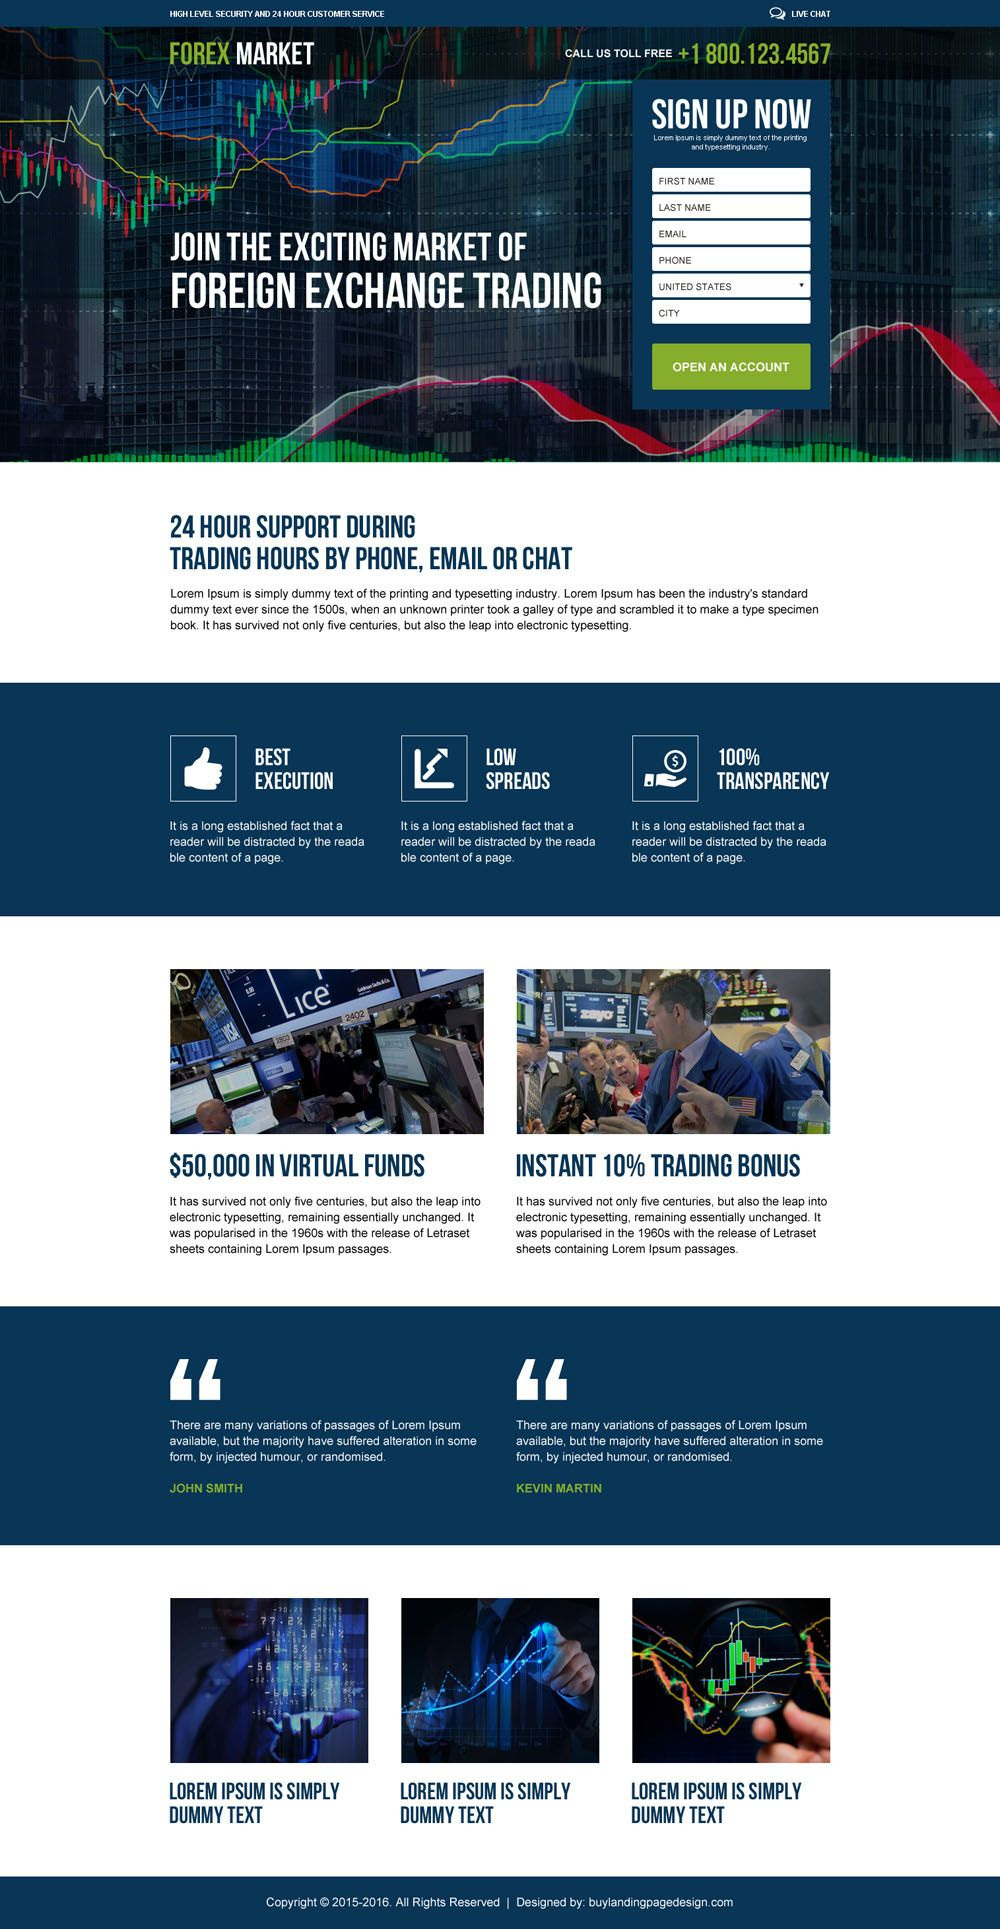 Foreign Exchange Trading Market Responsive Landing Page Design